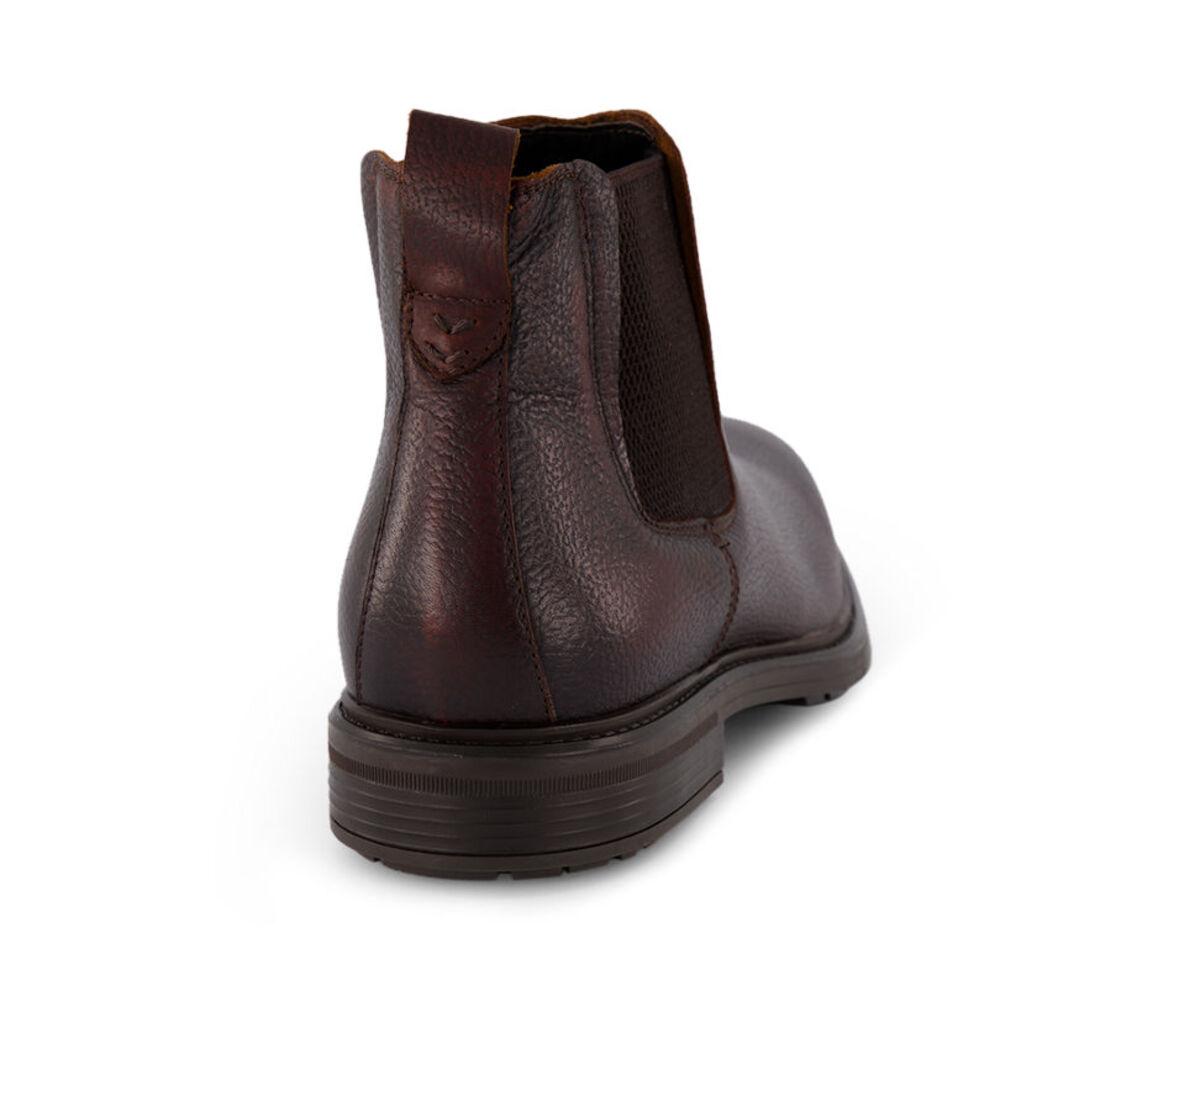 Bild 3 von Varese Chelsea-Boots - ACORES